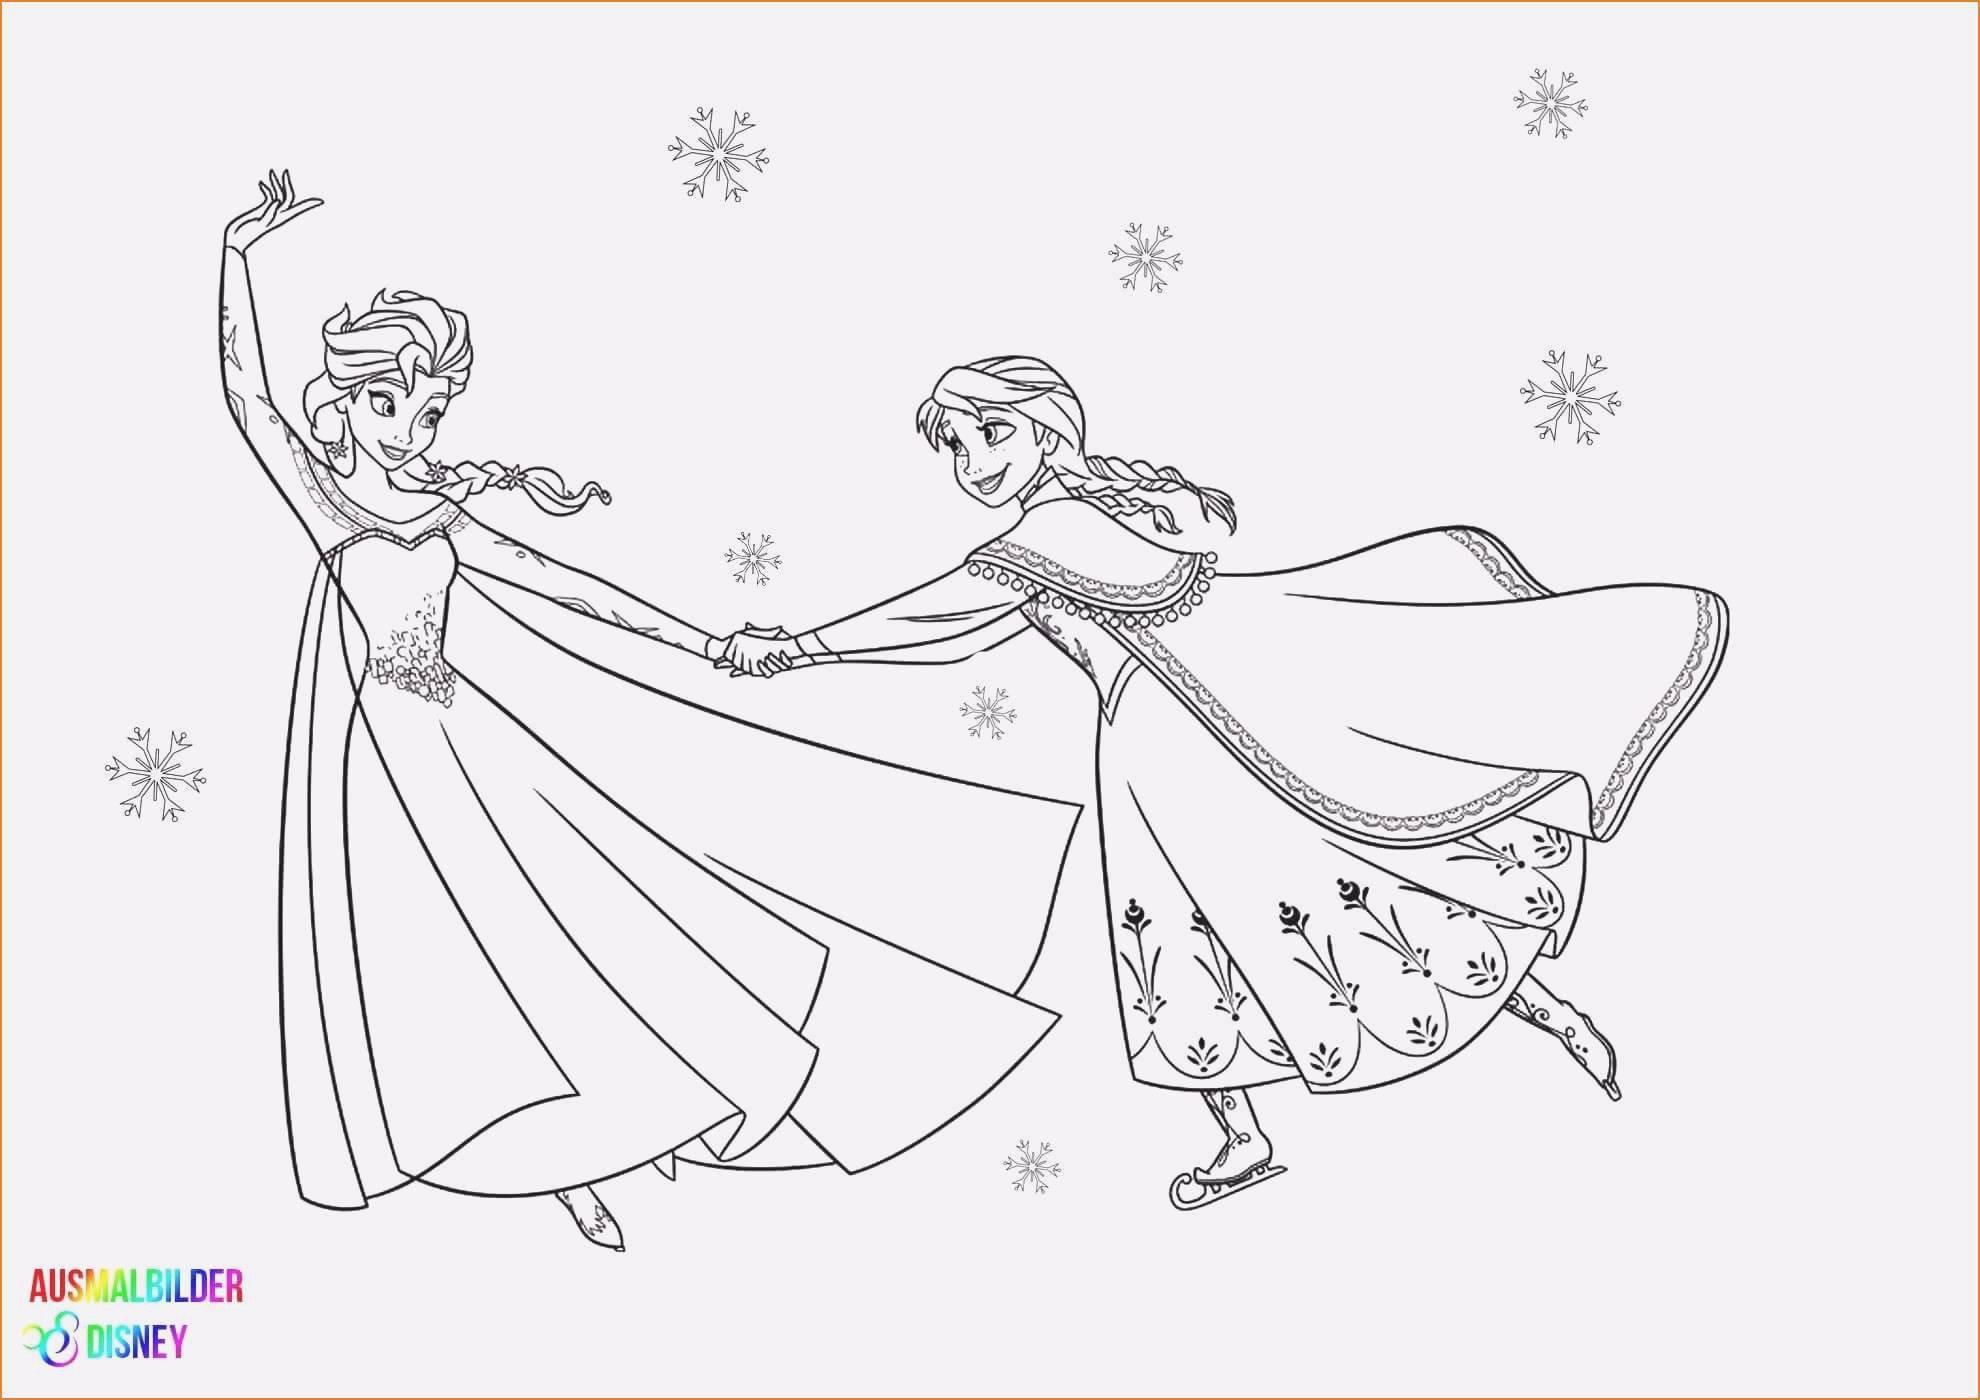 Ausmalbilder Prinzessin sofia Einzigartig 25 Fantastisch Ausmalbilder Vorlagen Prinzessin Bilder